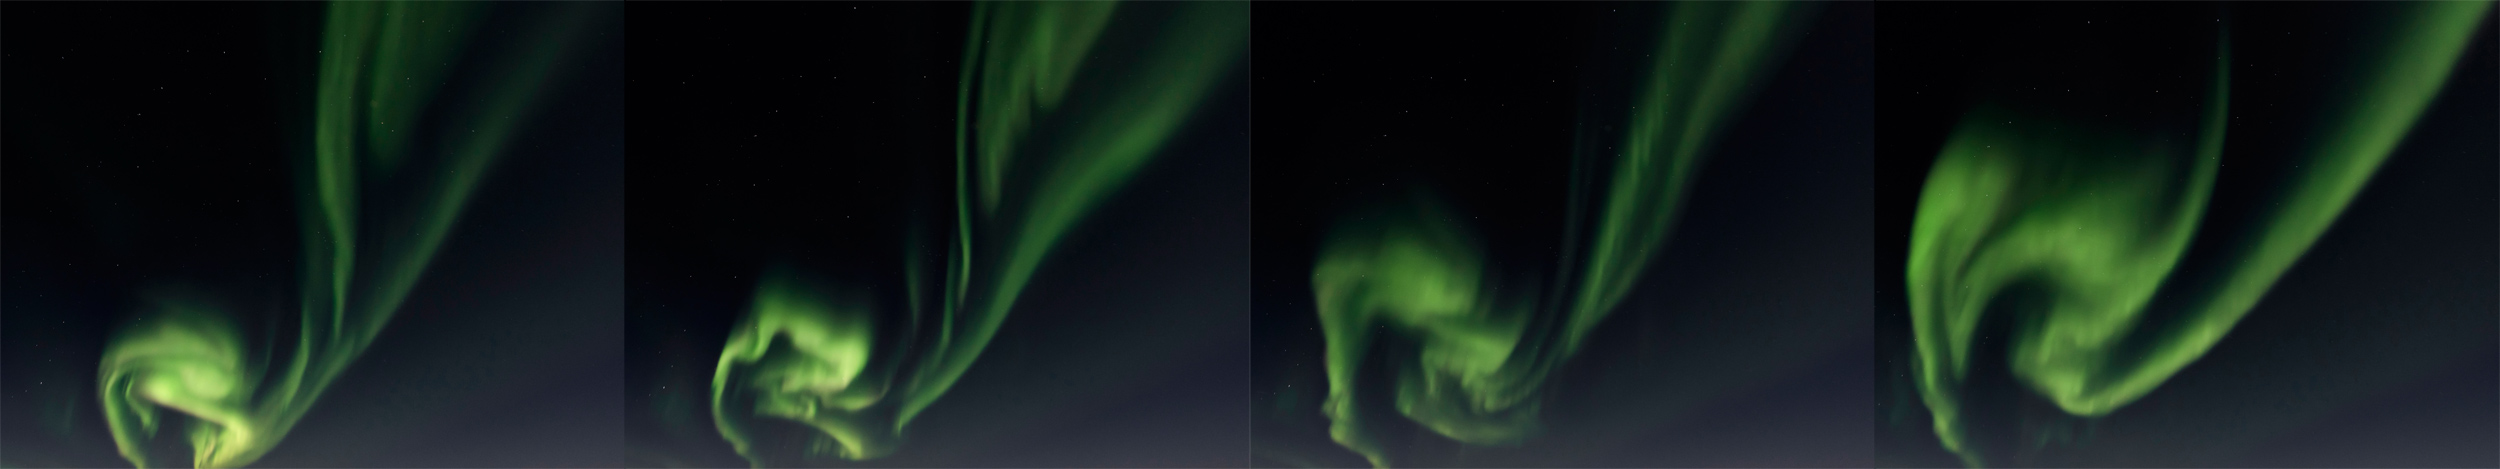 Voyage_Islande_Hiver_Anouk-Ruffieux_04.jpg